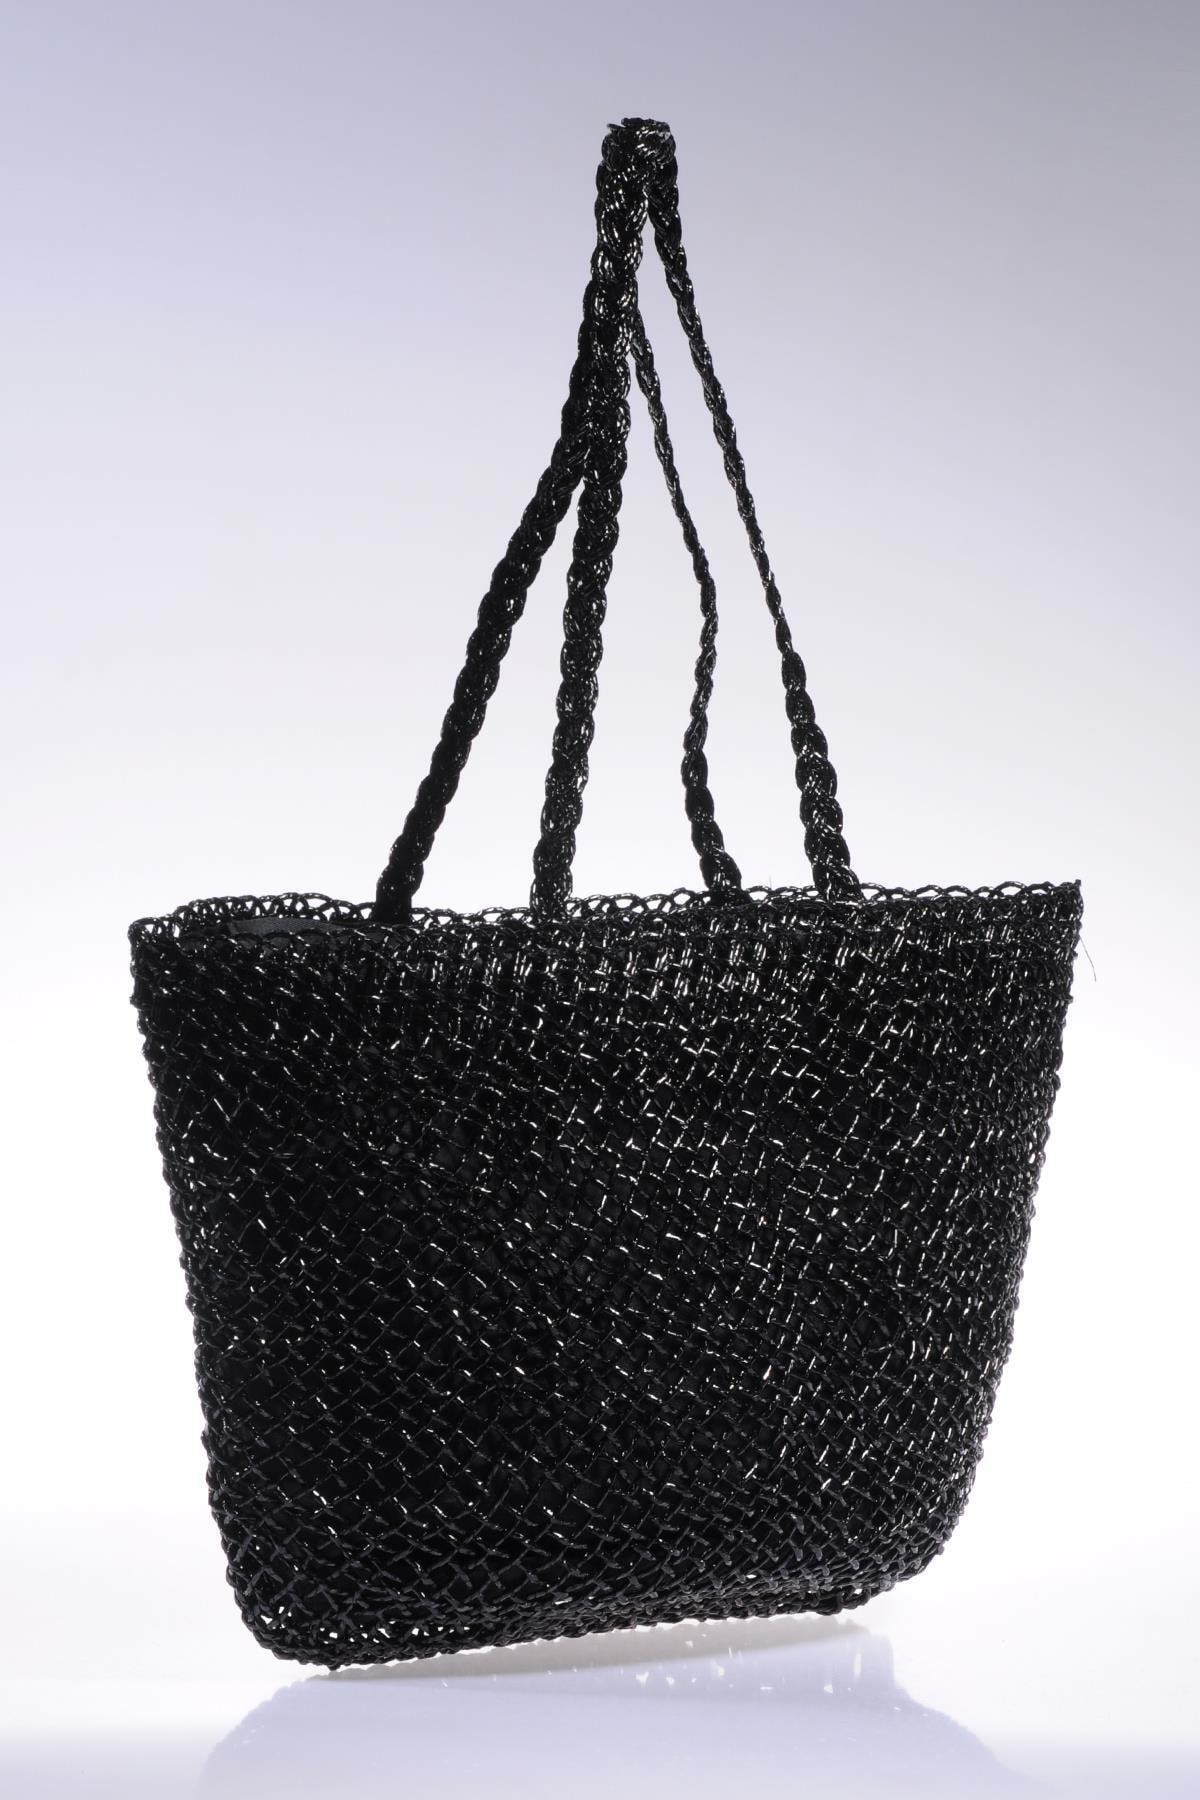 Sergio Giorgianni Kadın Siyah Omuz Çantası sghsr1014-siyah